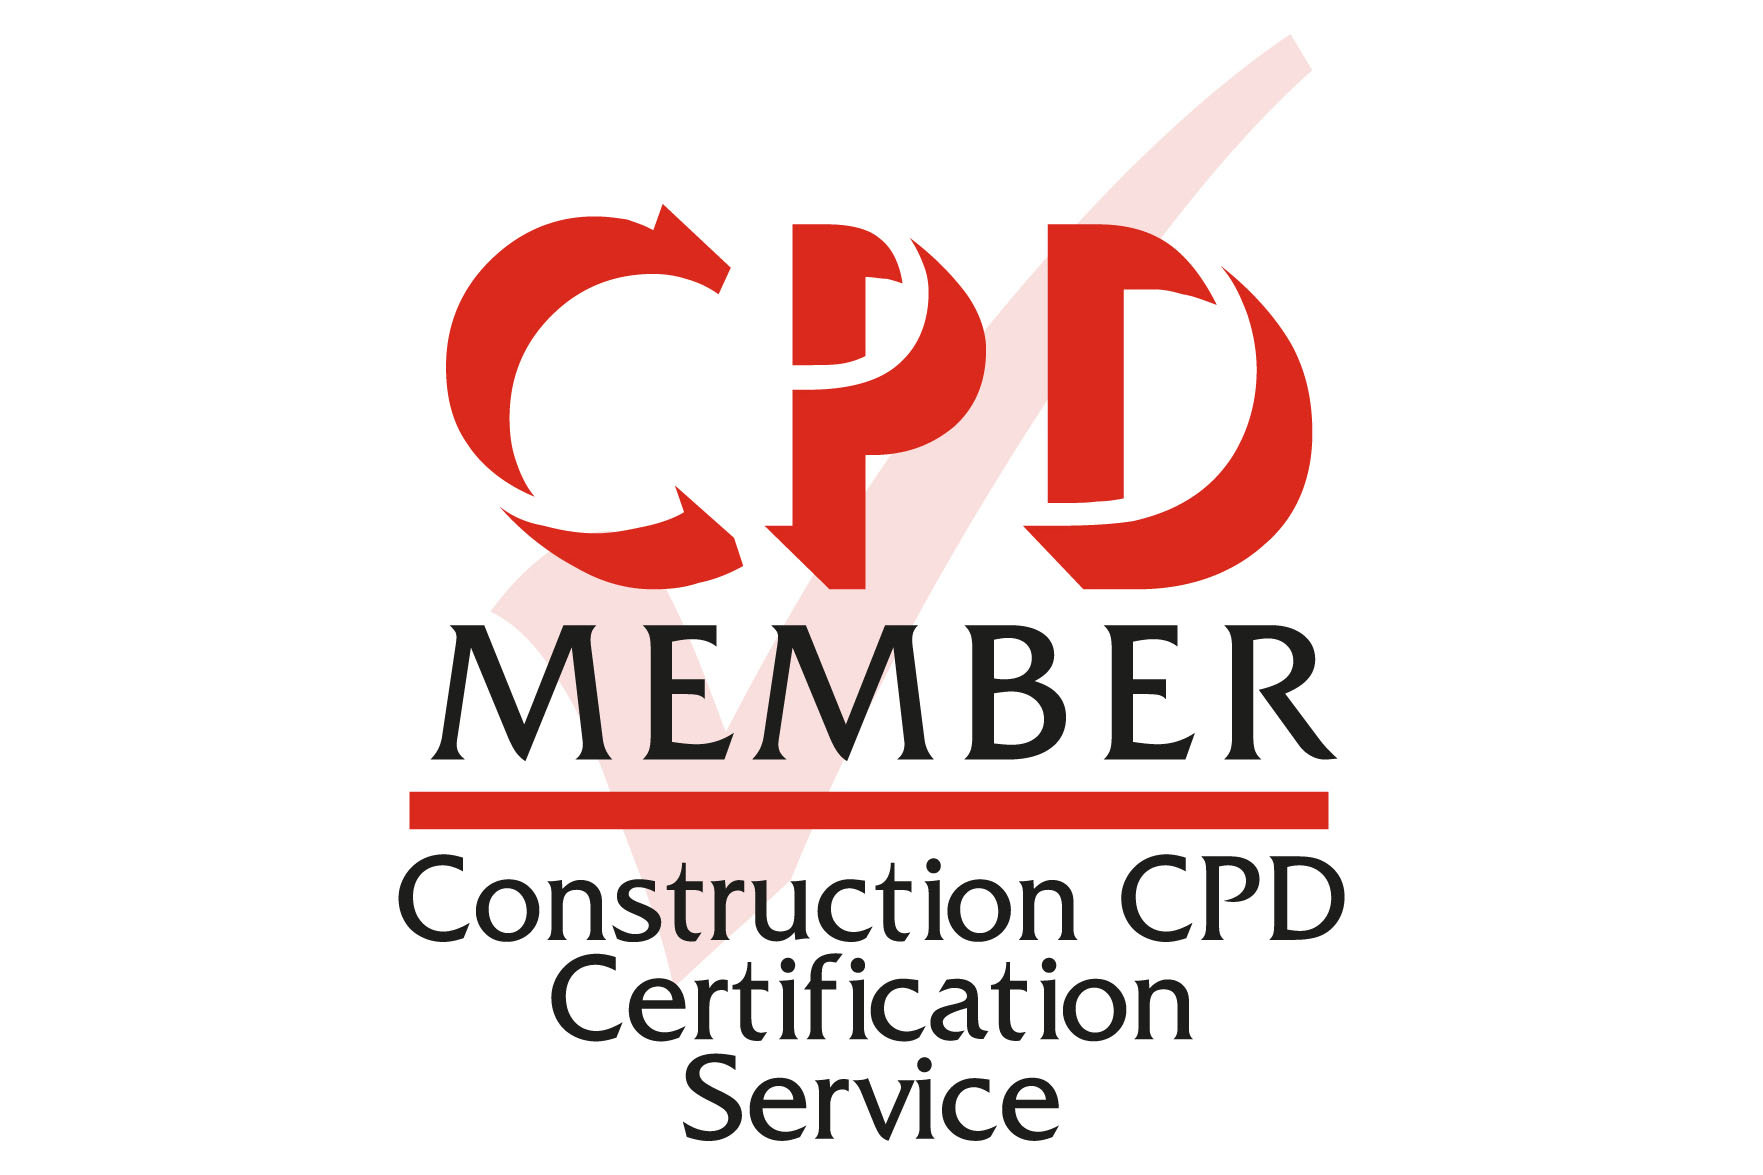 cpd_member_construction_cert_485_rgb-01